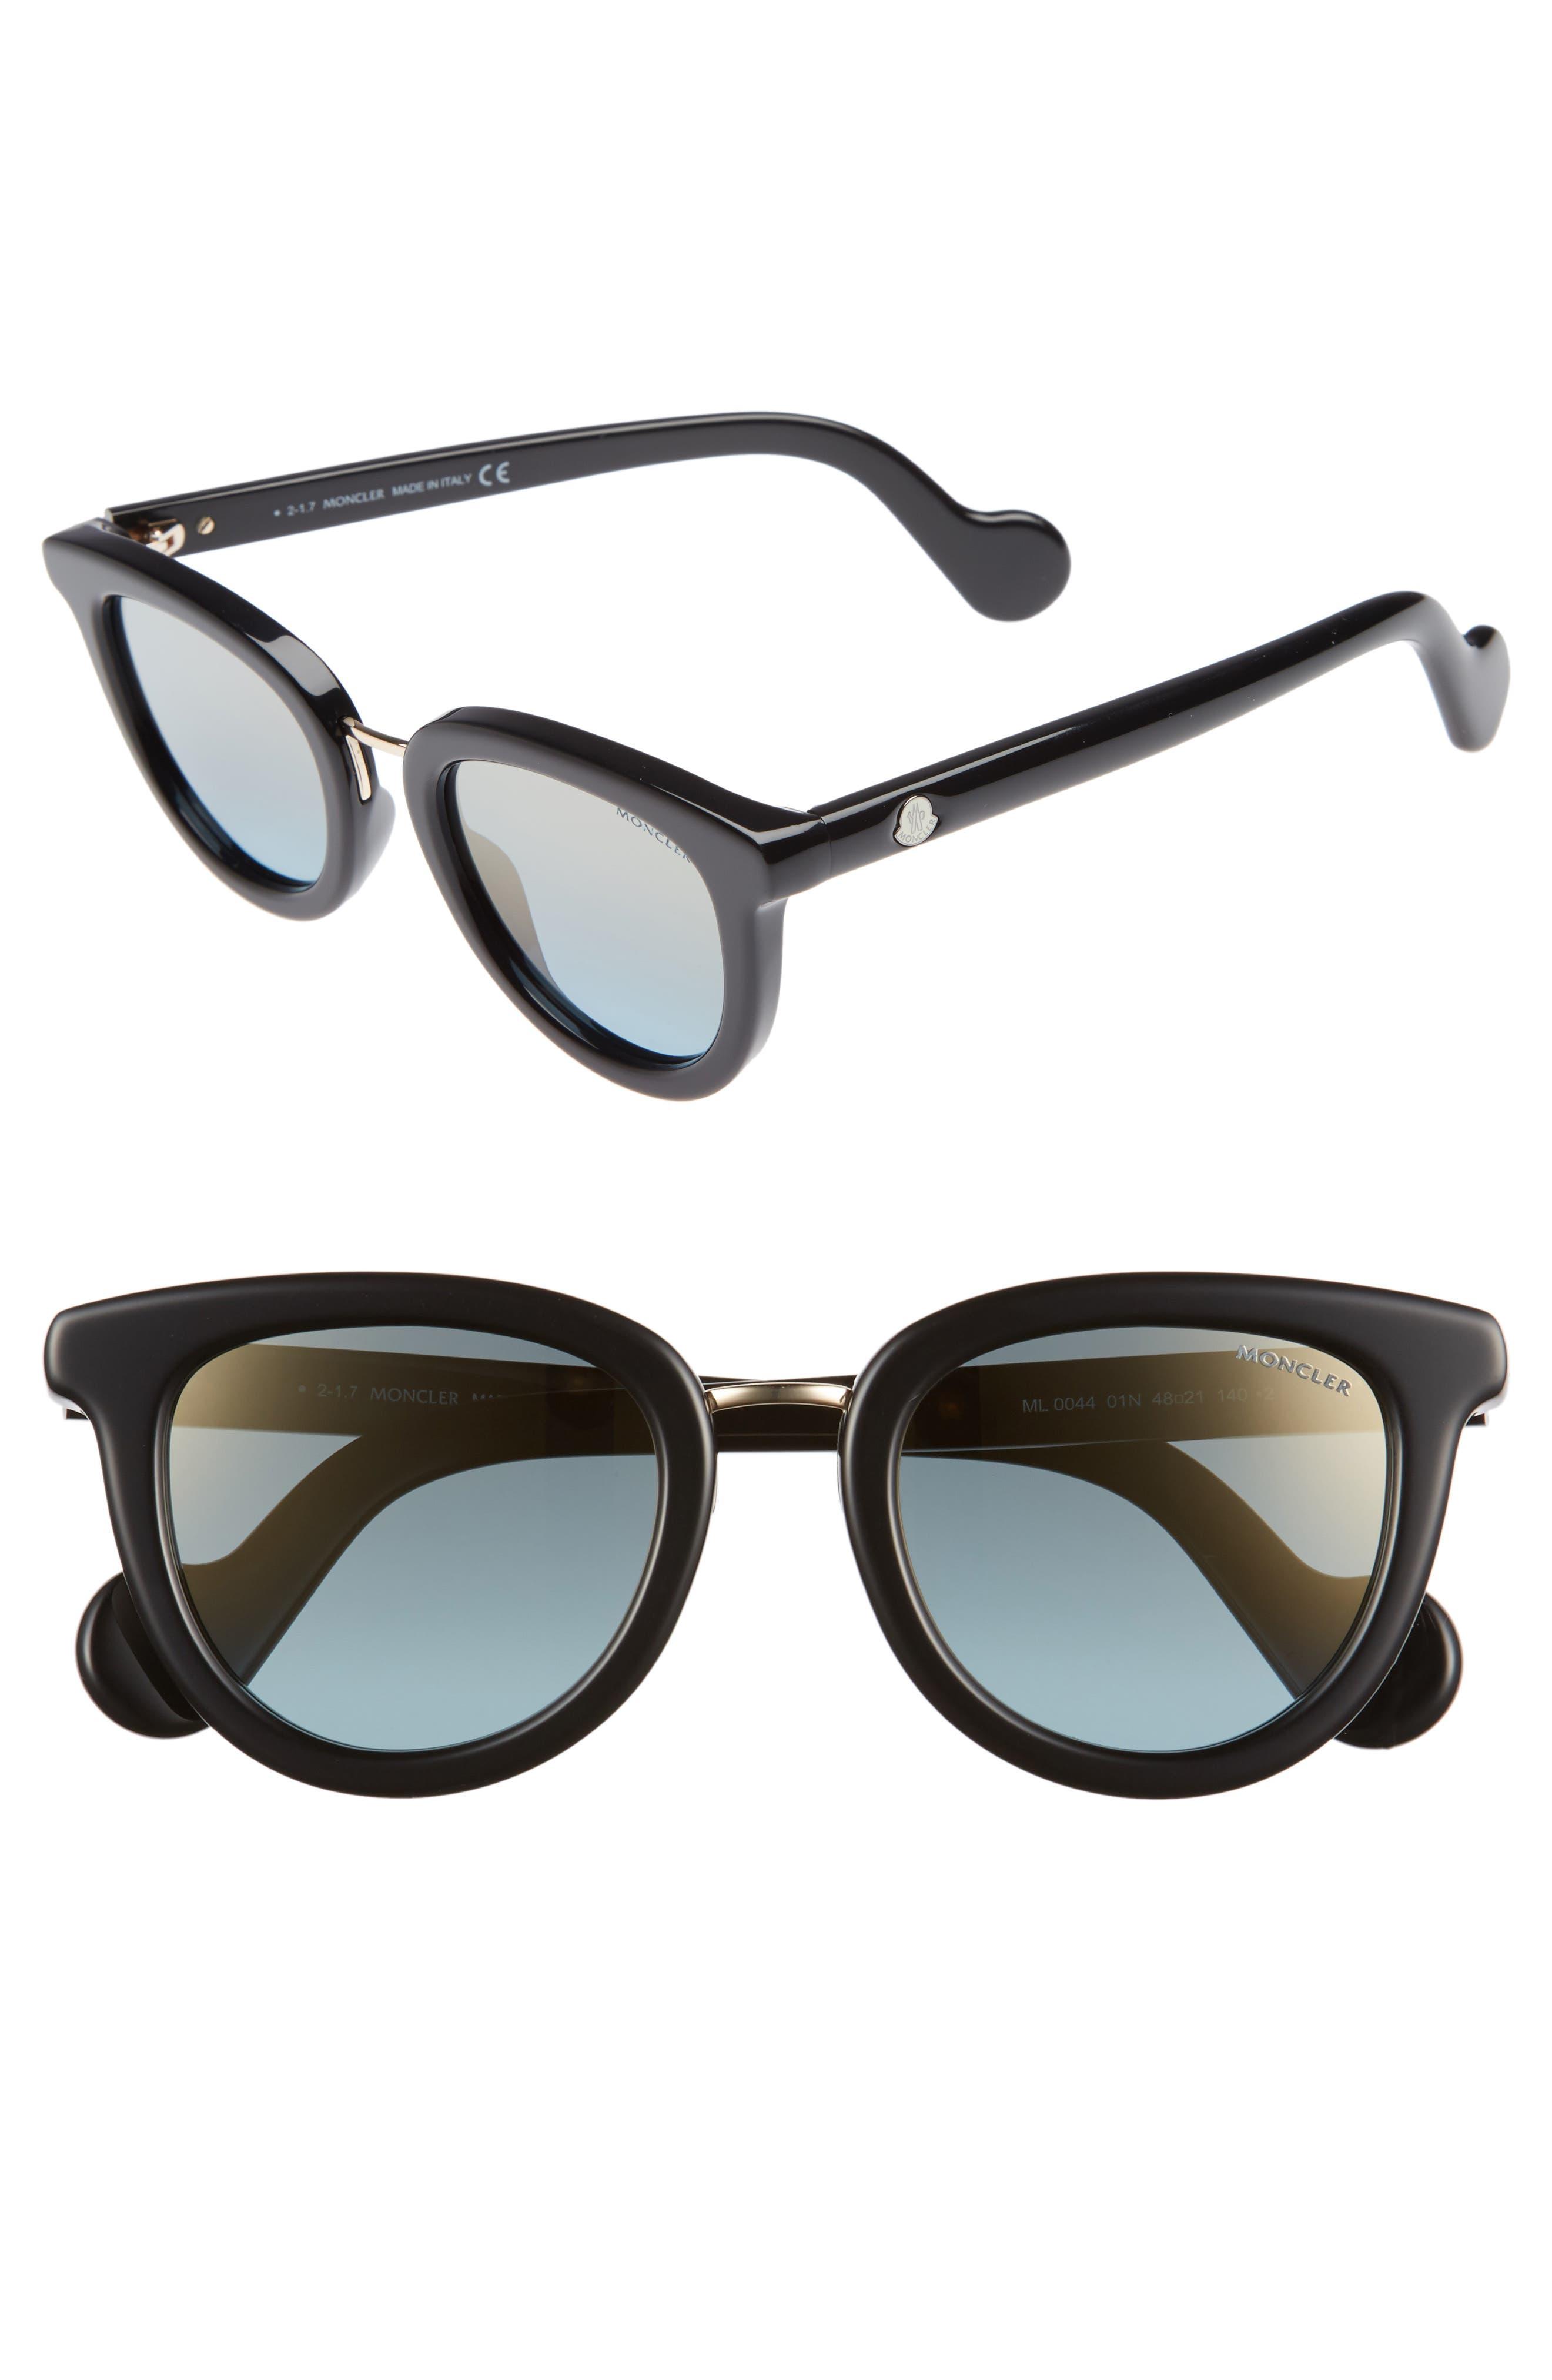 48mm Cat Eye Sunglasses,                         Main,                         color, BLACK/ PALE GOLD/ LIGHT BLUE